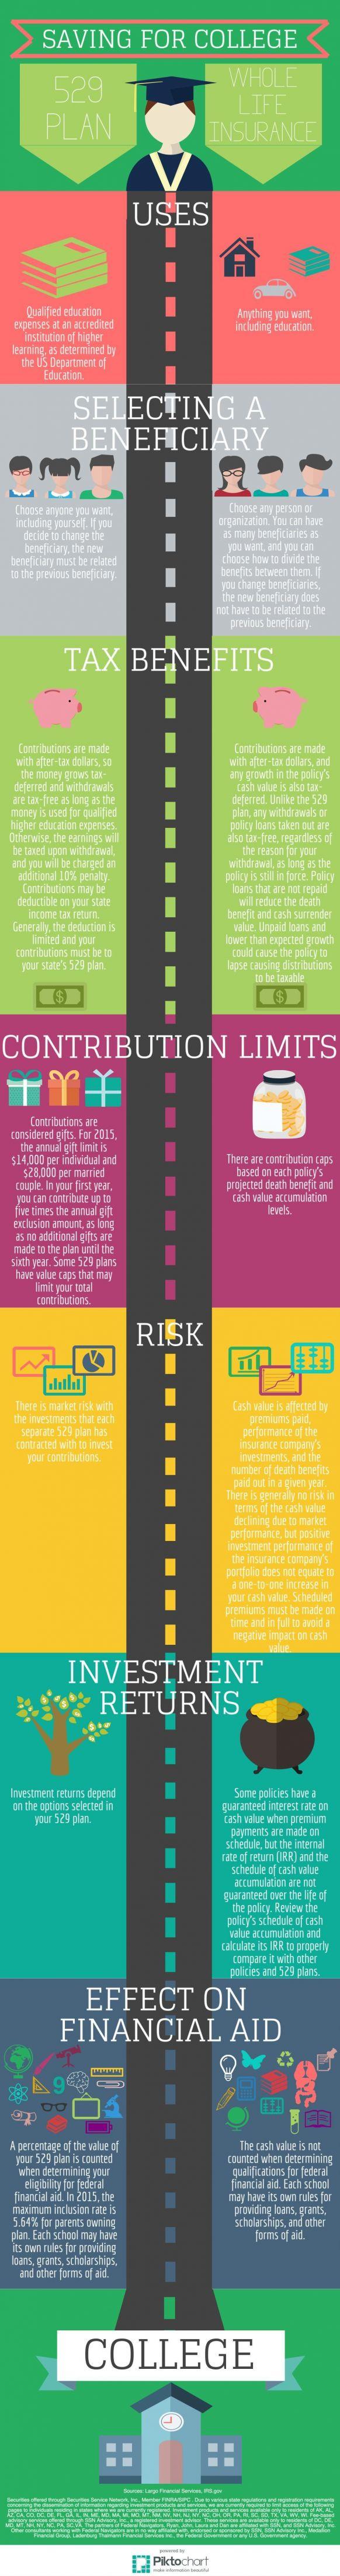 529 Plan vs. Life Insurance #retirementplanning # ...